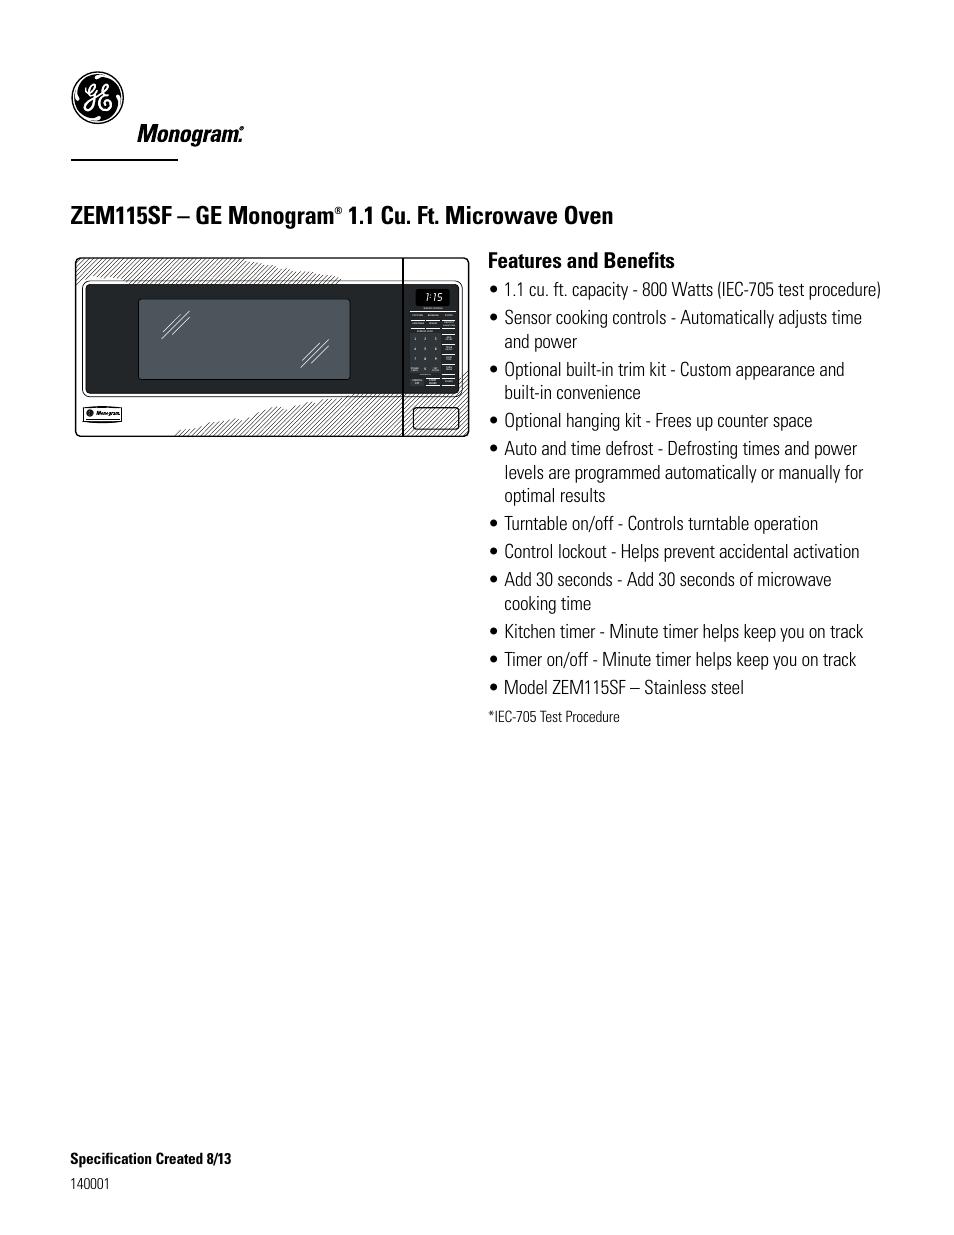 zem115sf ge monogram 1 cu ft microwave oven features and rh manualsdir com GE Electric Clocks Vintage GE Clock Radio